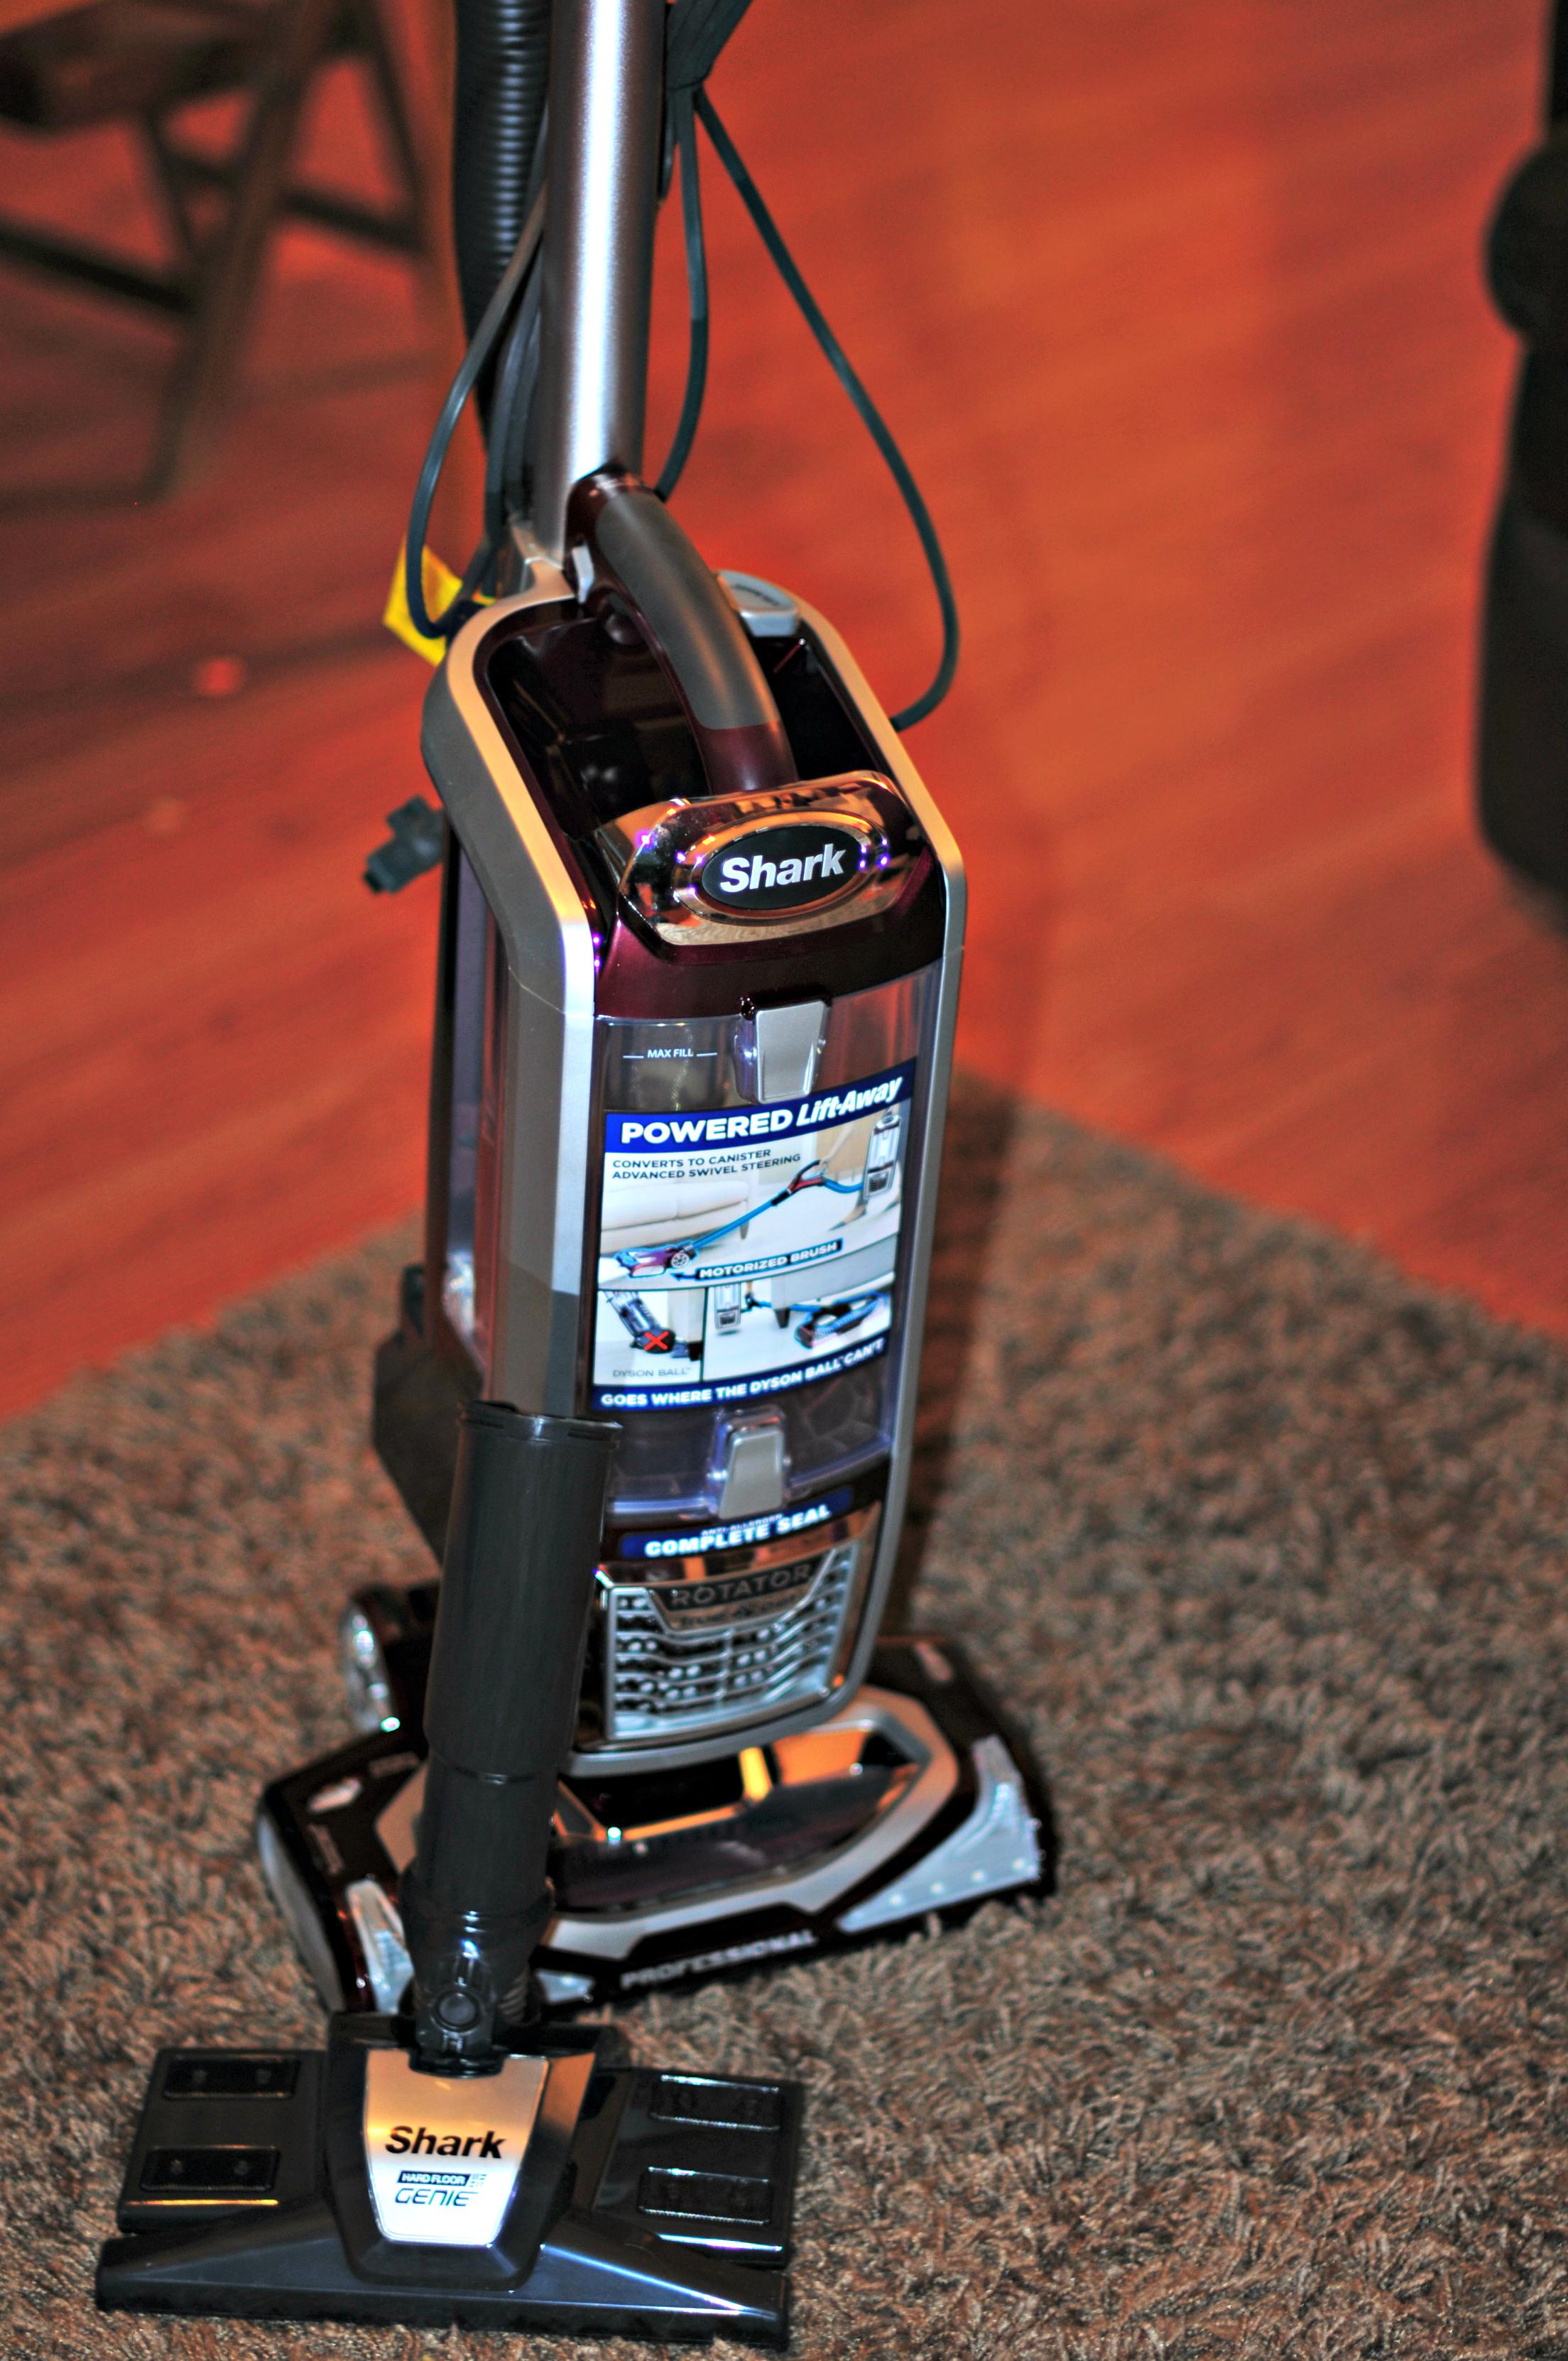 Shark Rotator Powered Lift Away Vacuum With True Pet